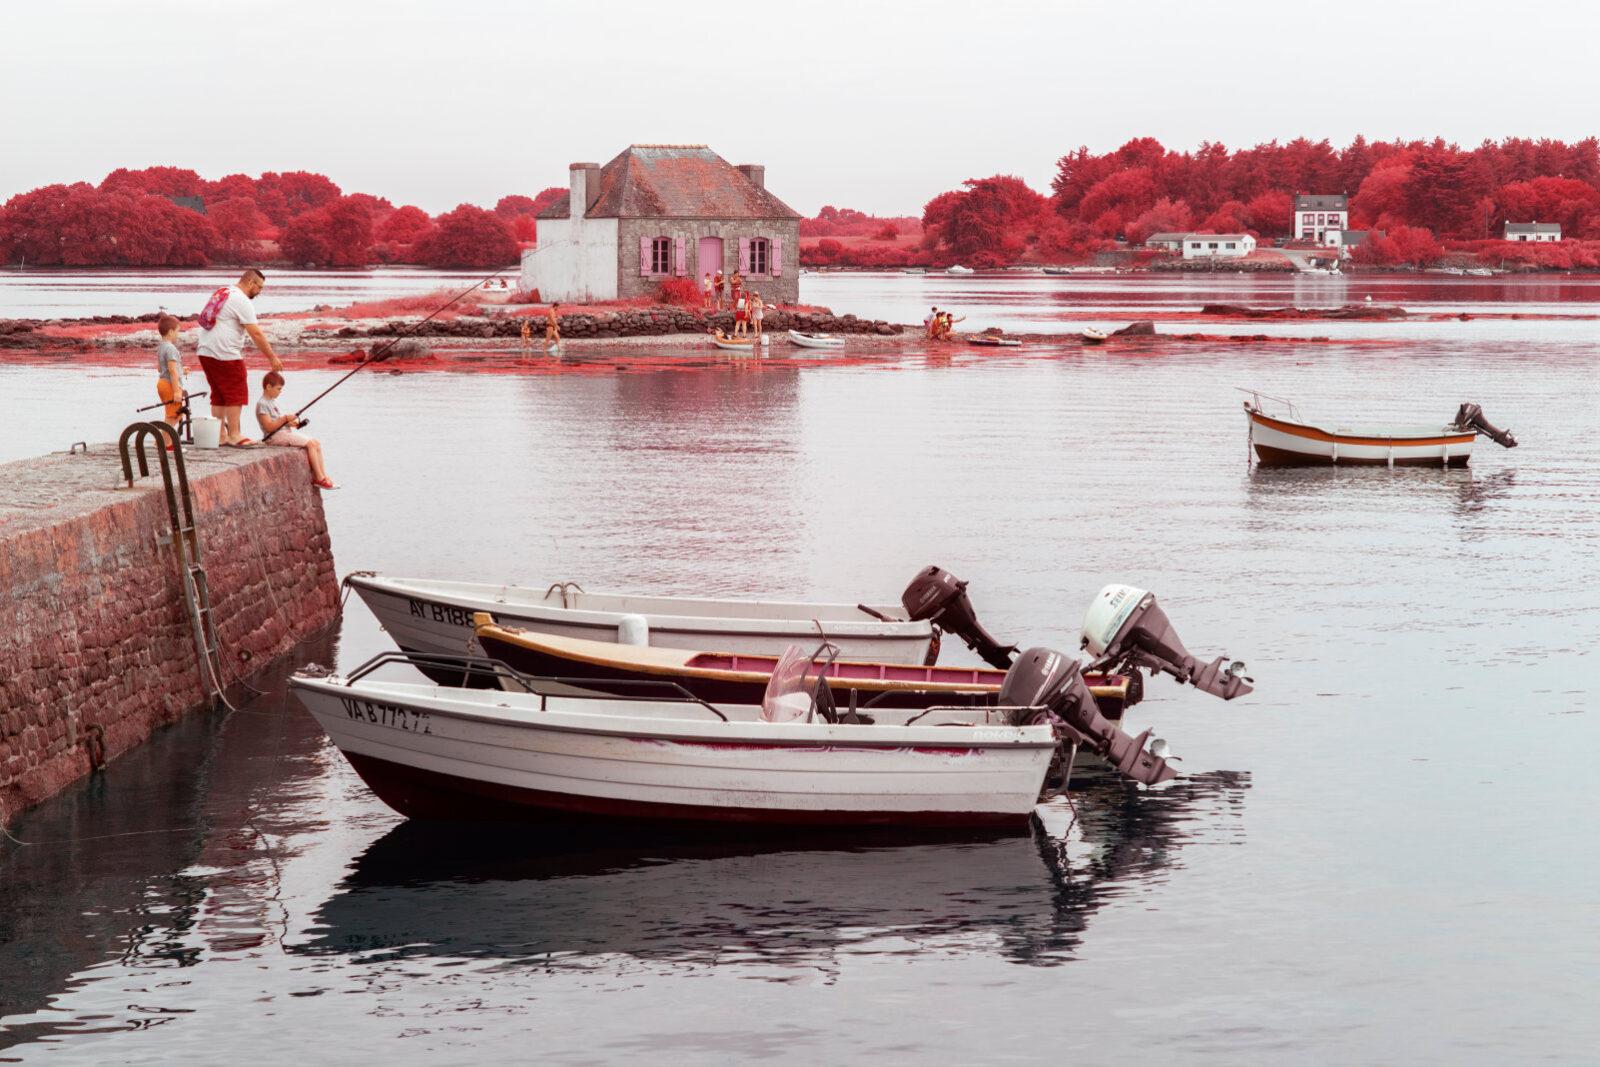 Bretagne-Morbihan-tourisme-patrimoine-nature-payage-infrarouge-aerochrome-alternatif-rouge-artiste-photographe-Pierre-Louis-Ferrer